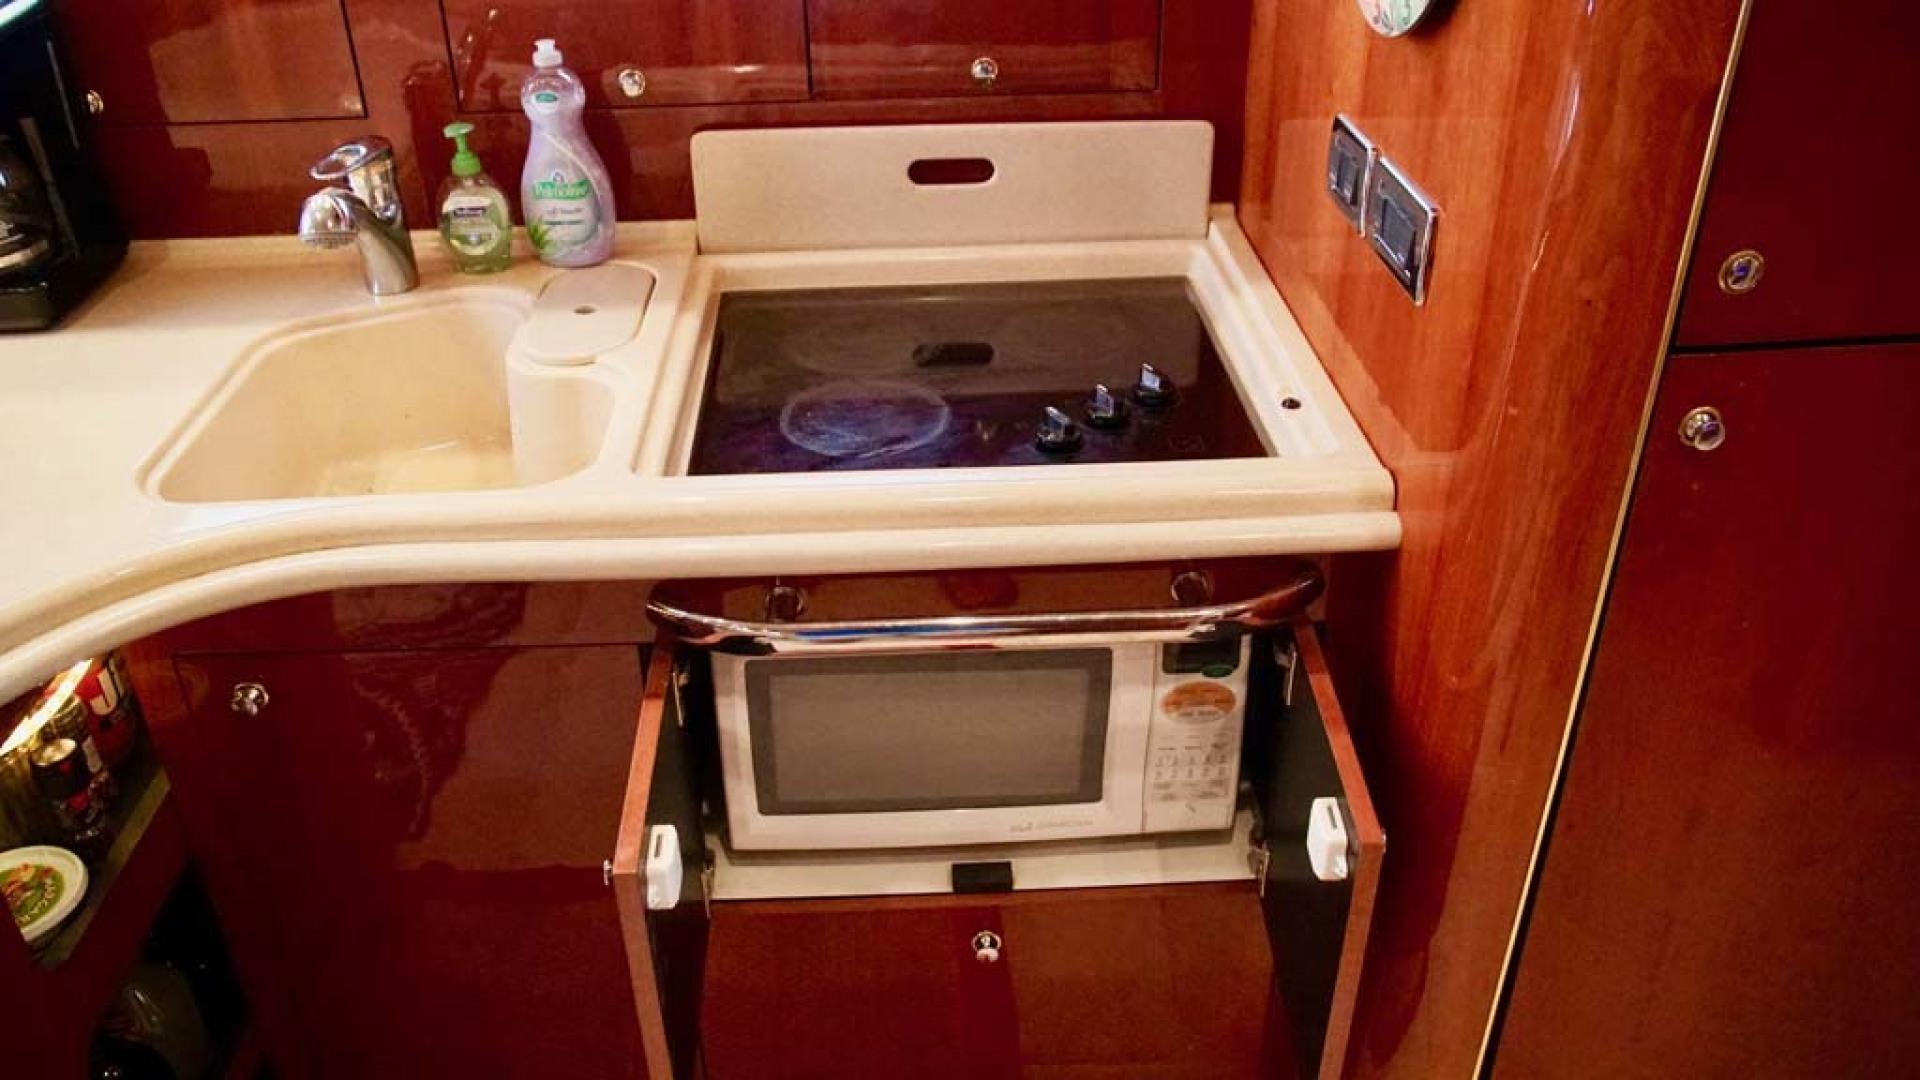 Sea Ray-510 Sundancer 2002-Therapy Orange Beach-Alabama-United States-Stove / Microwave-1074380 | Thumbnail